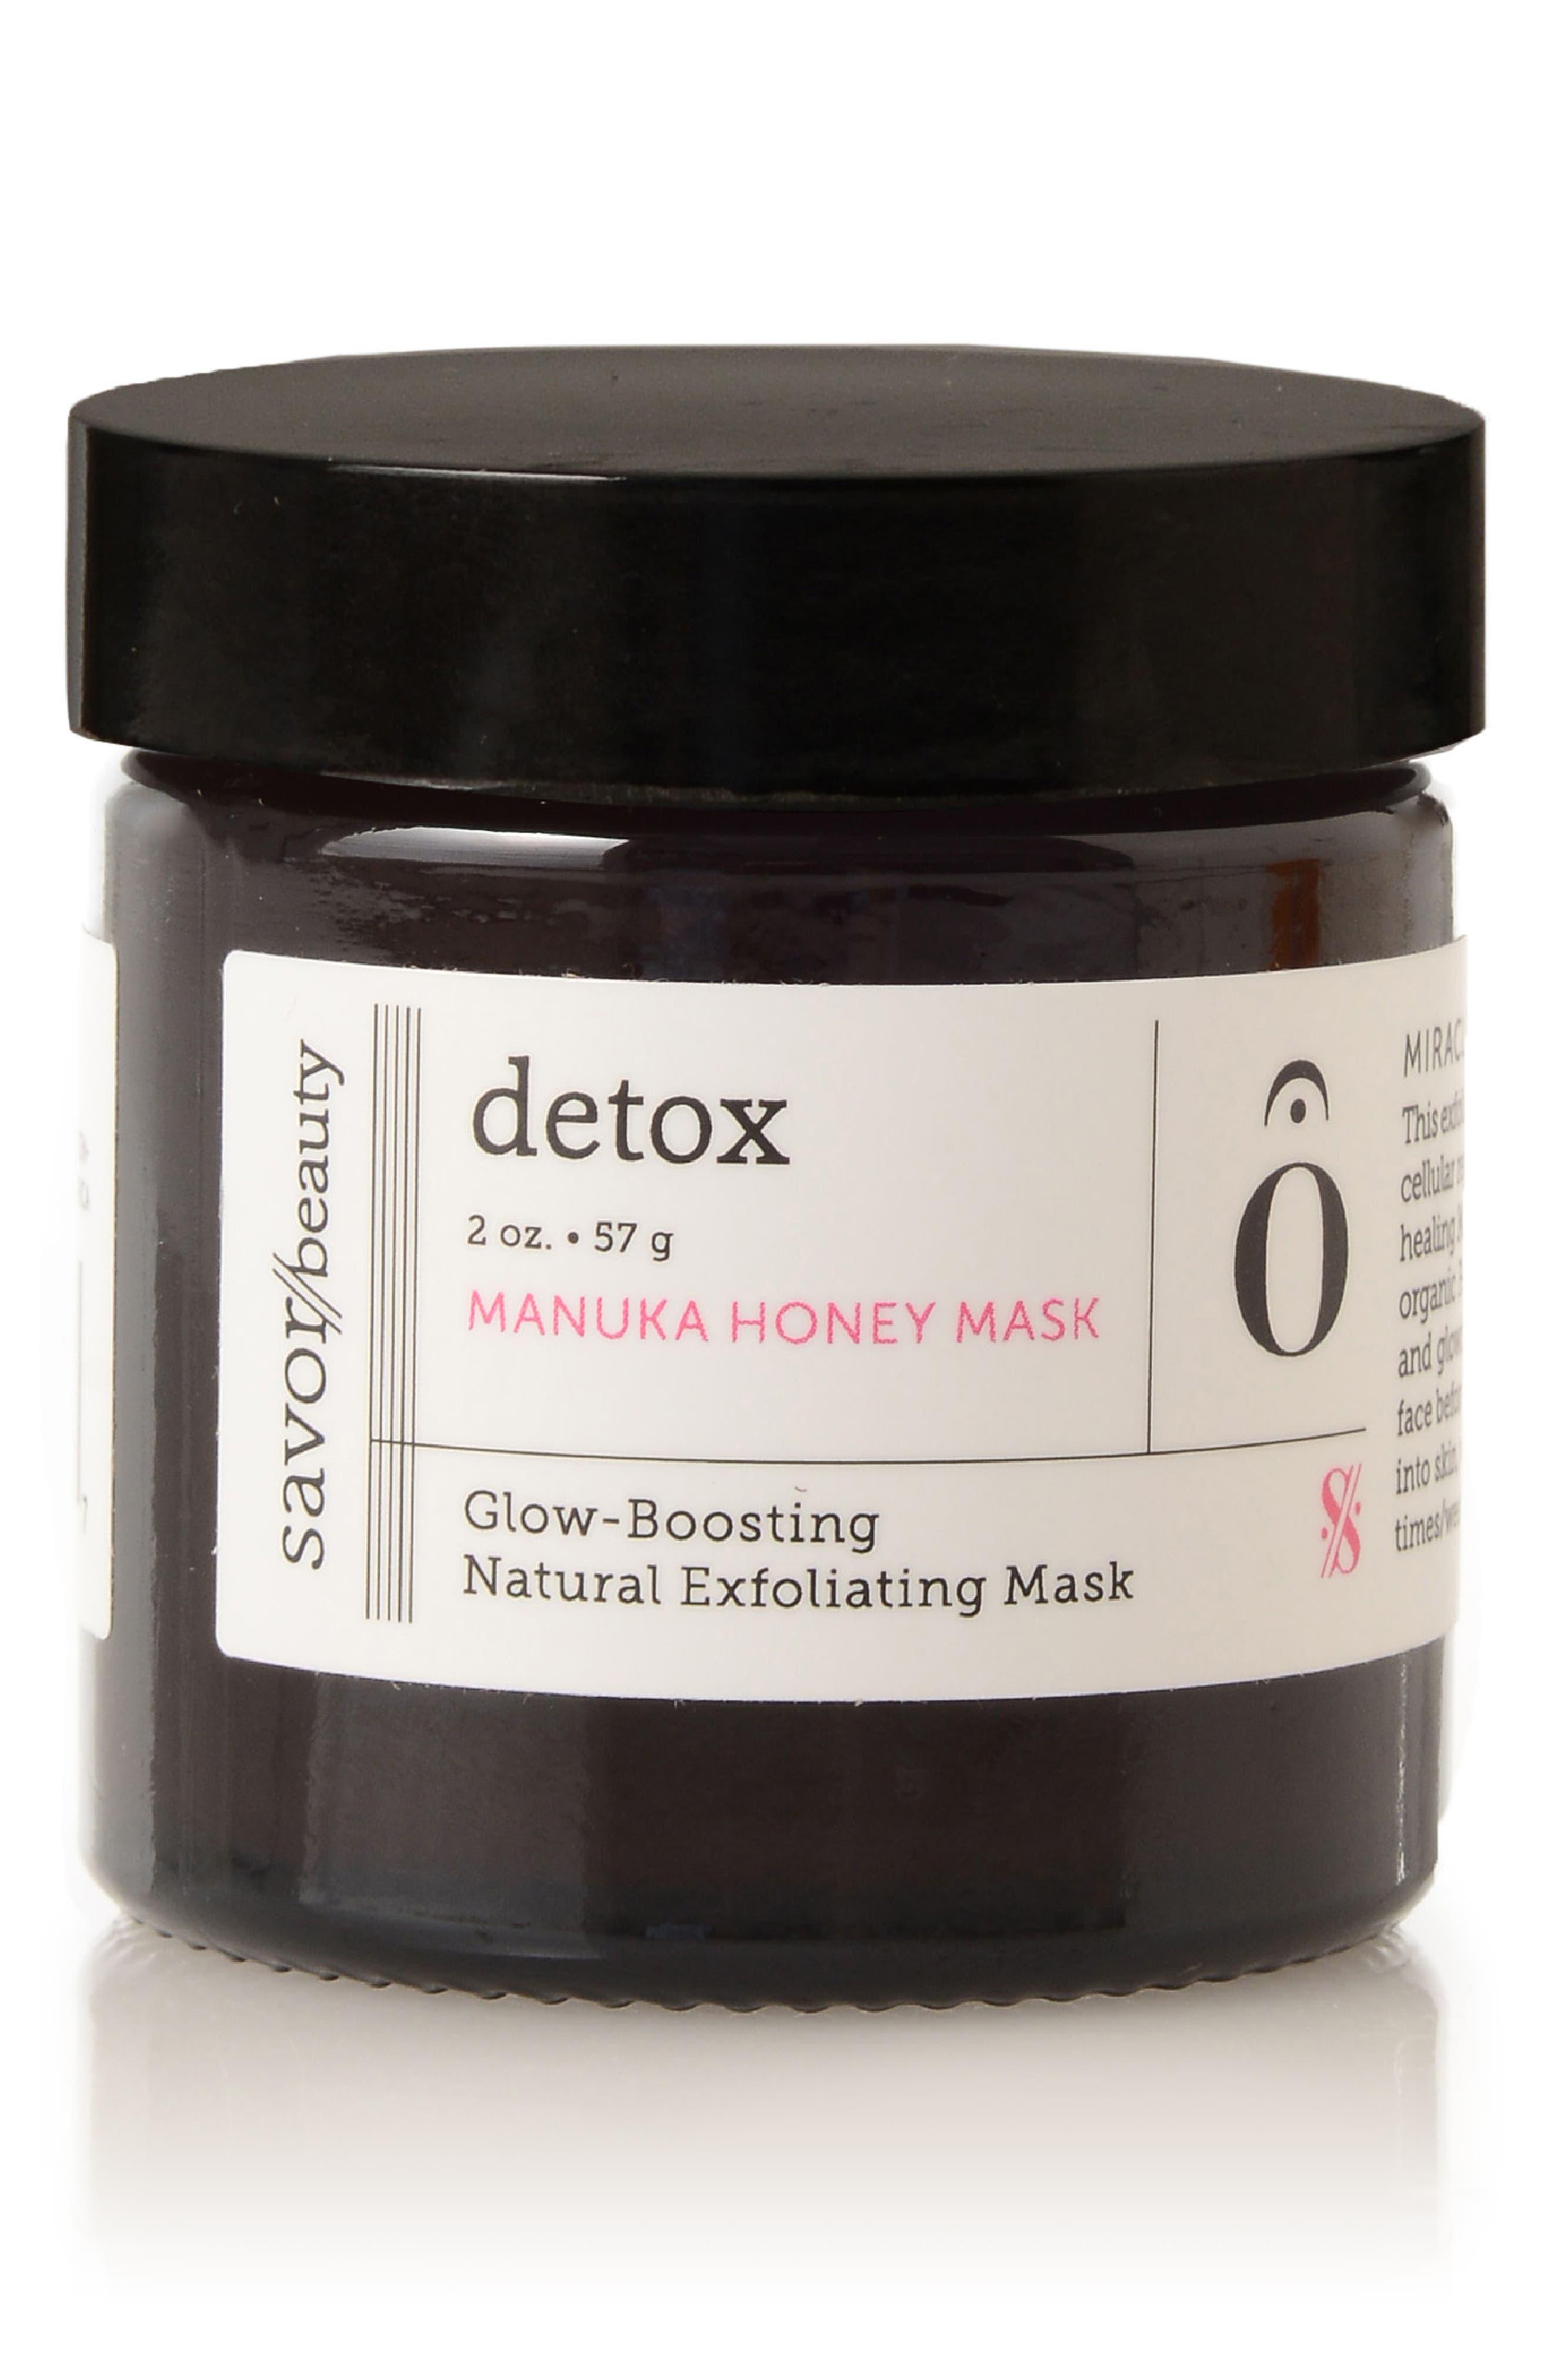 Detox Manuka Honey Mask,                             Main thumbnail 1, color,                             No Color